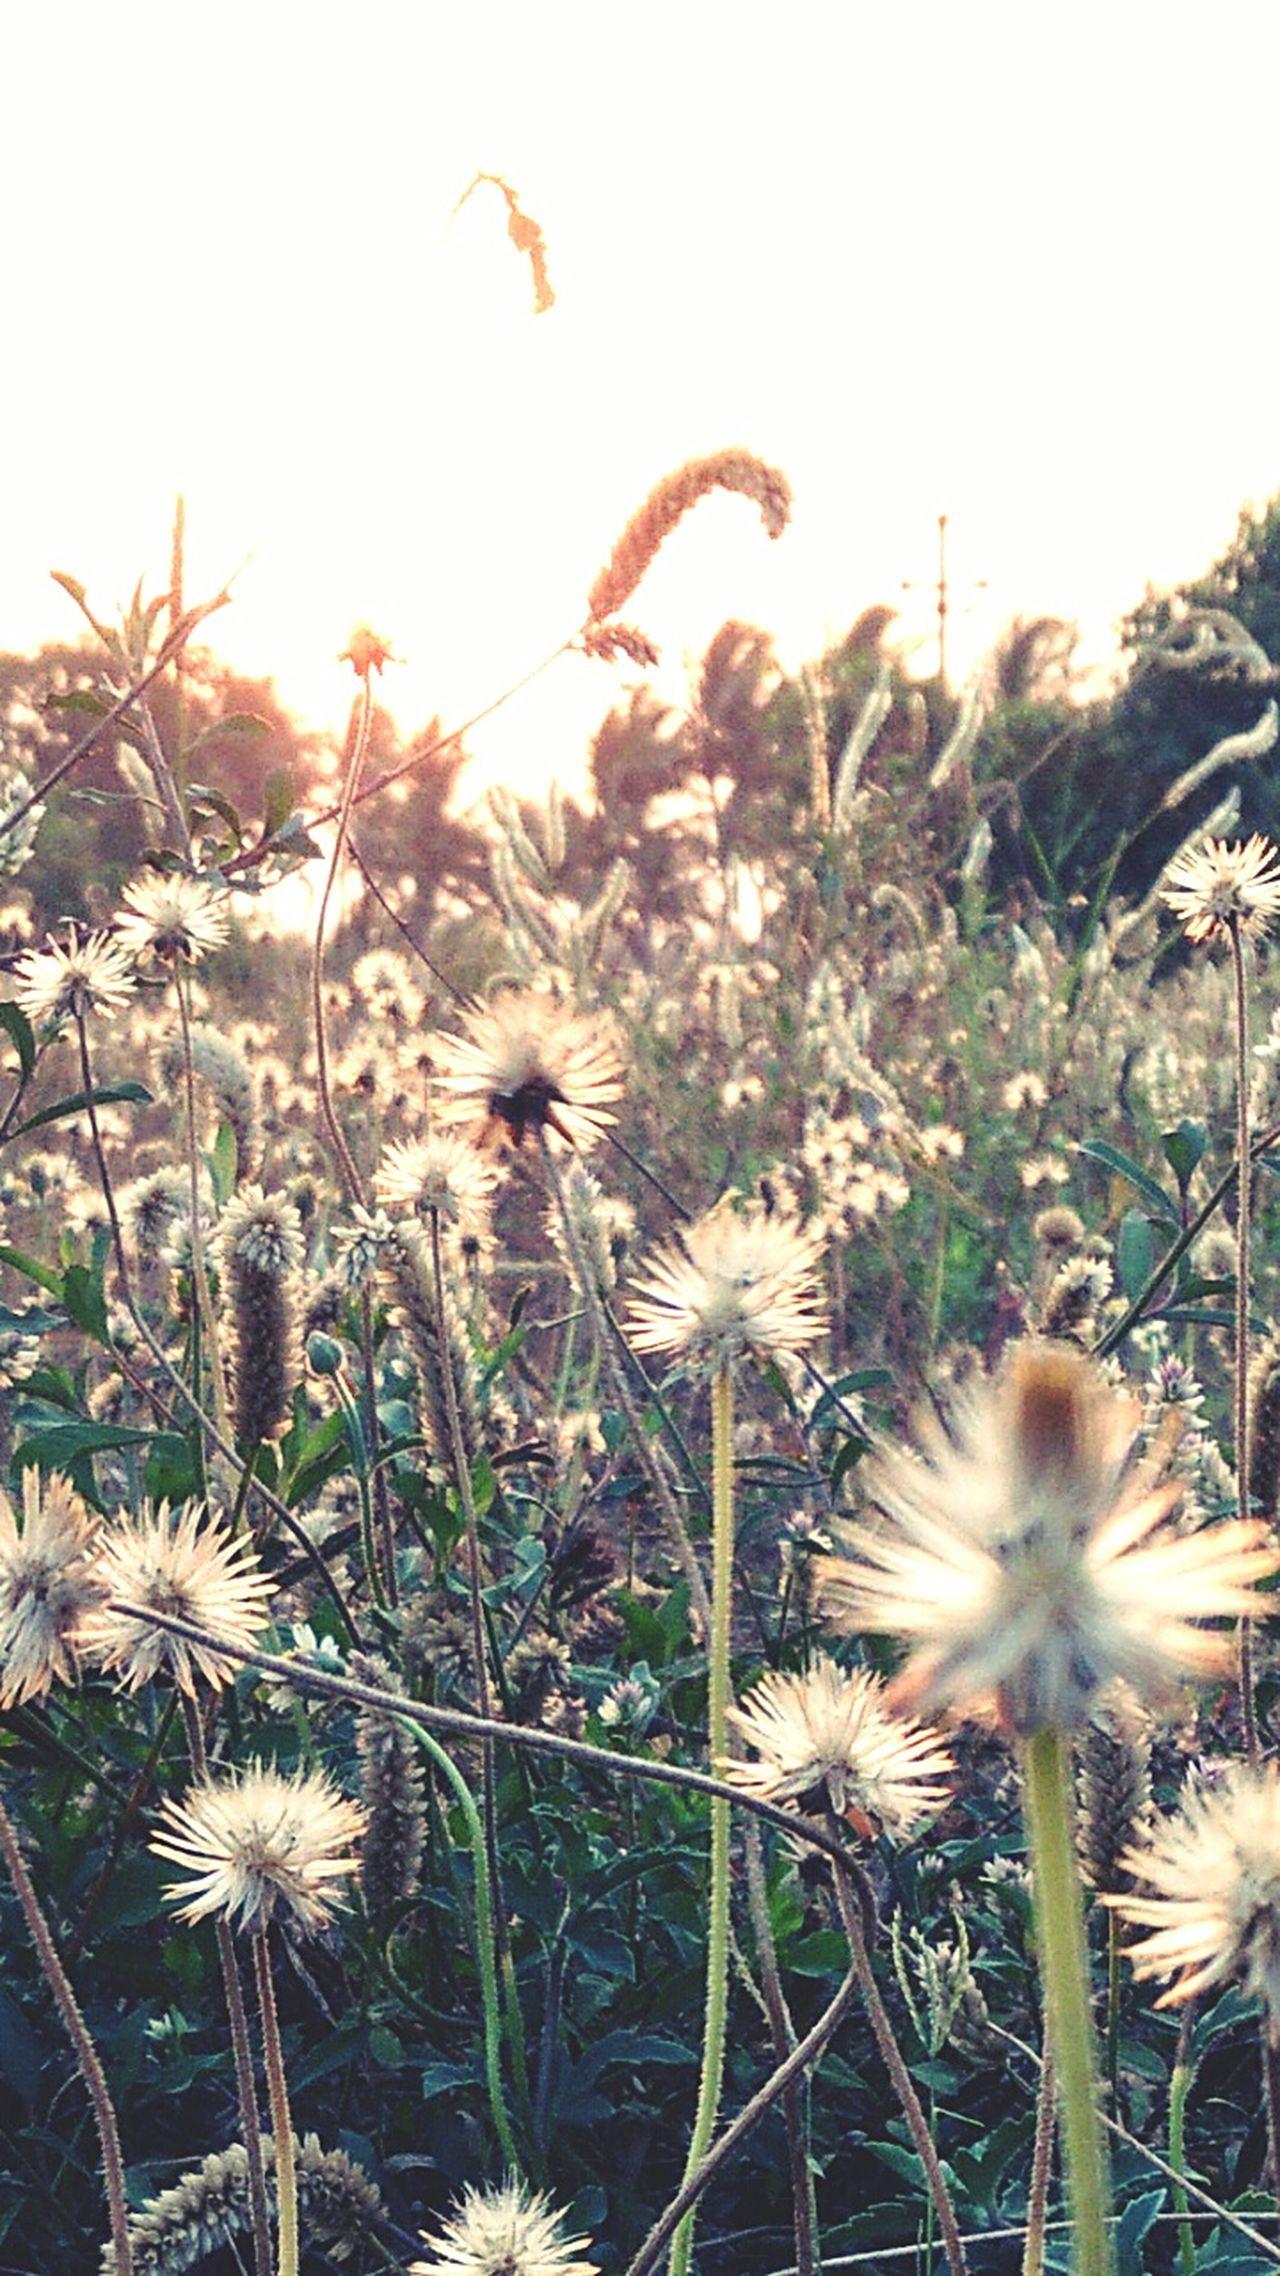 Dandelion Flowers Little Buds Smiling Always :)